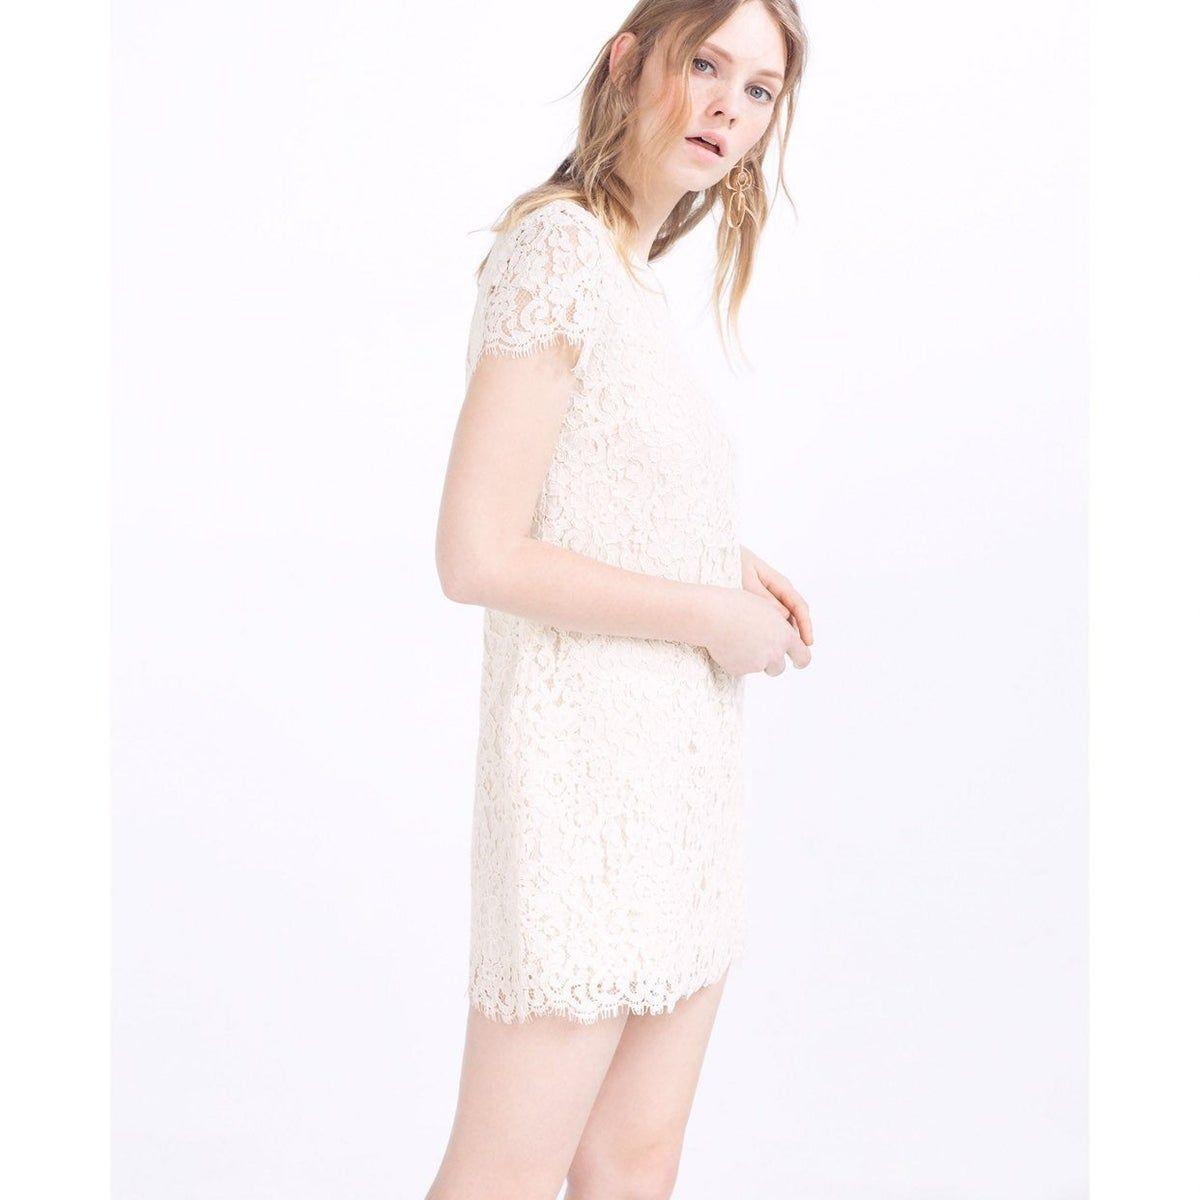 Zara Cream Lace Lined Summer Shift Dress Lace White Dress Lace Spring Dress Lace Wedding Guest Dress [ 1200 x 1200 Pixel ]